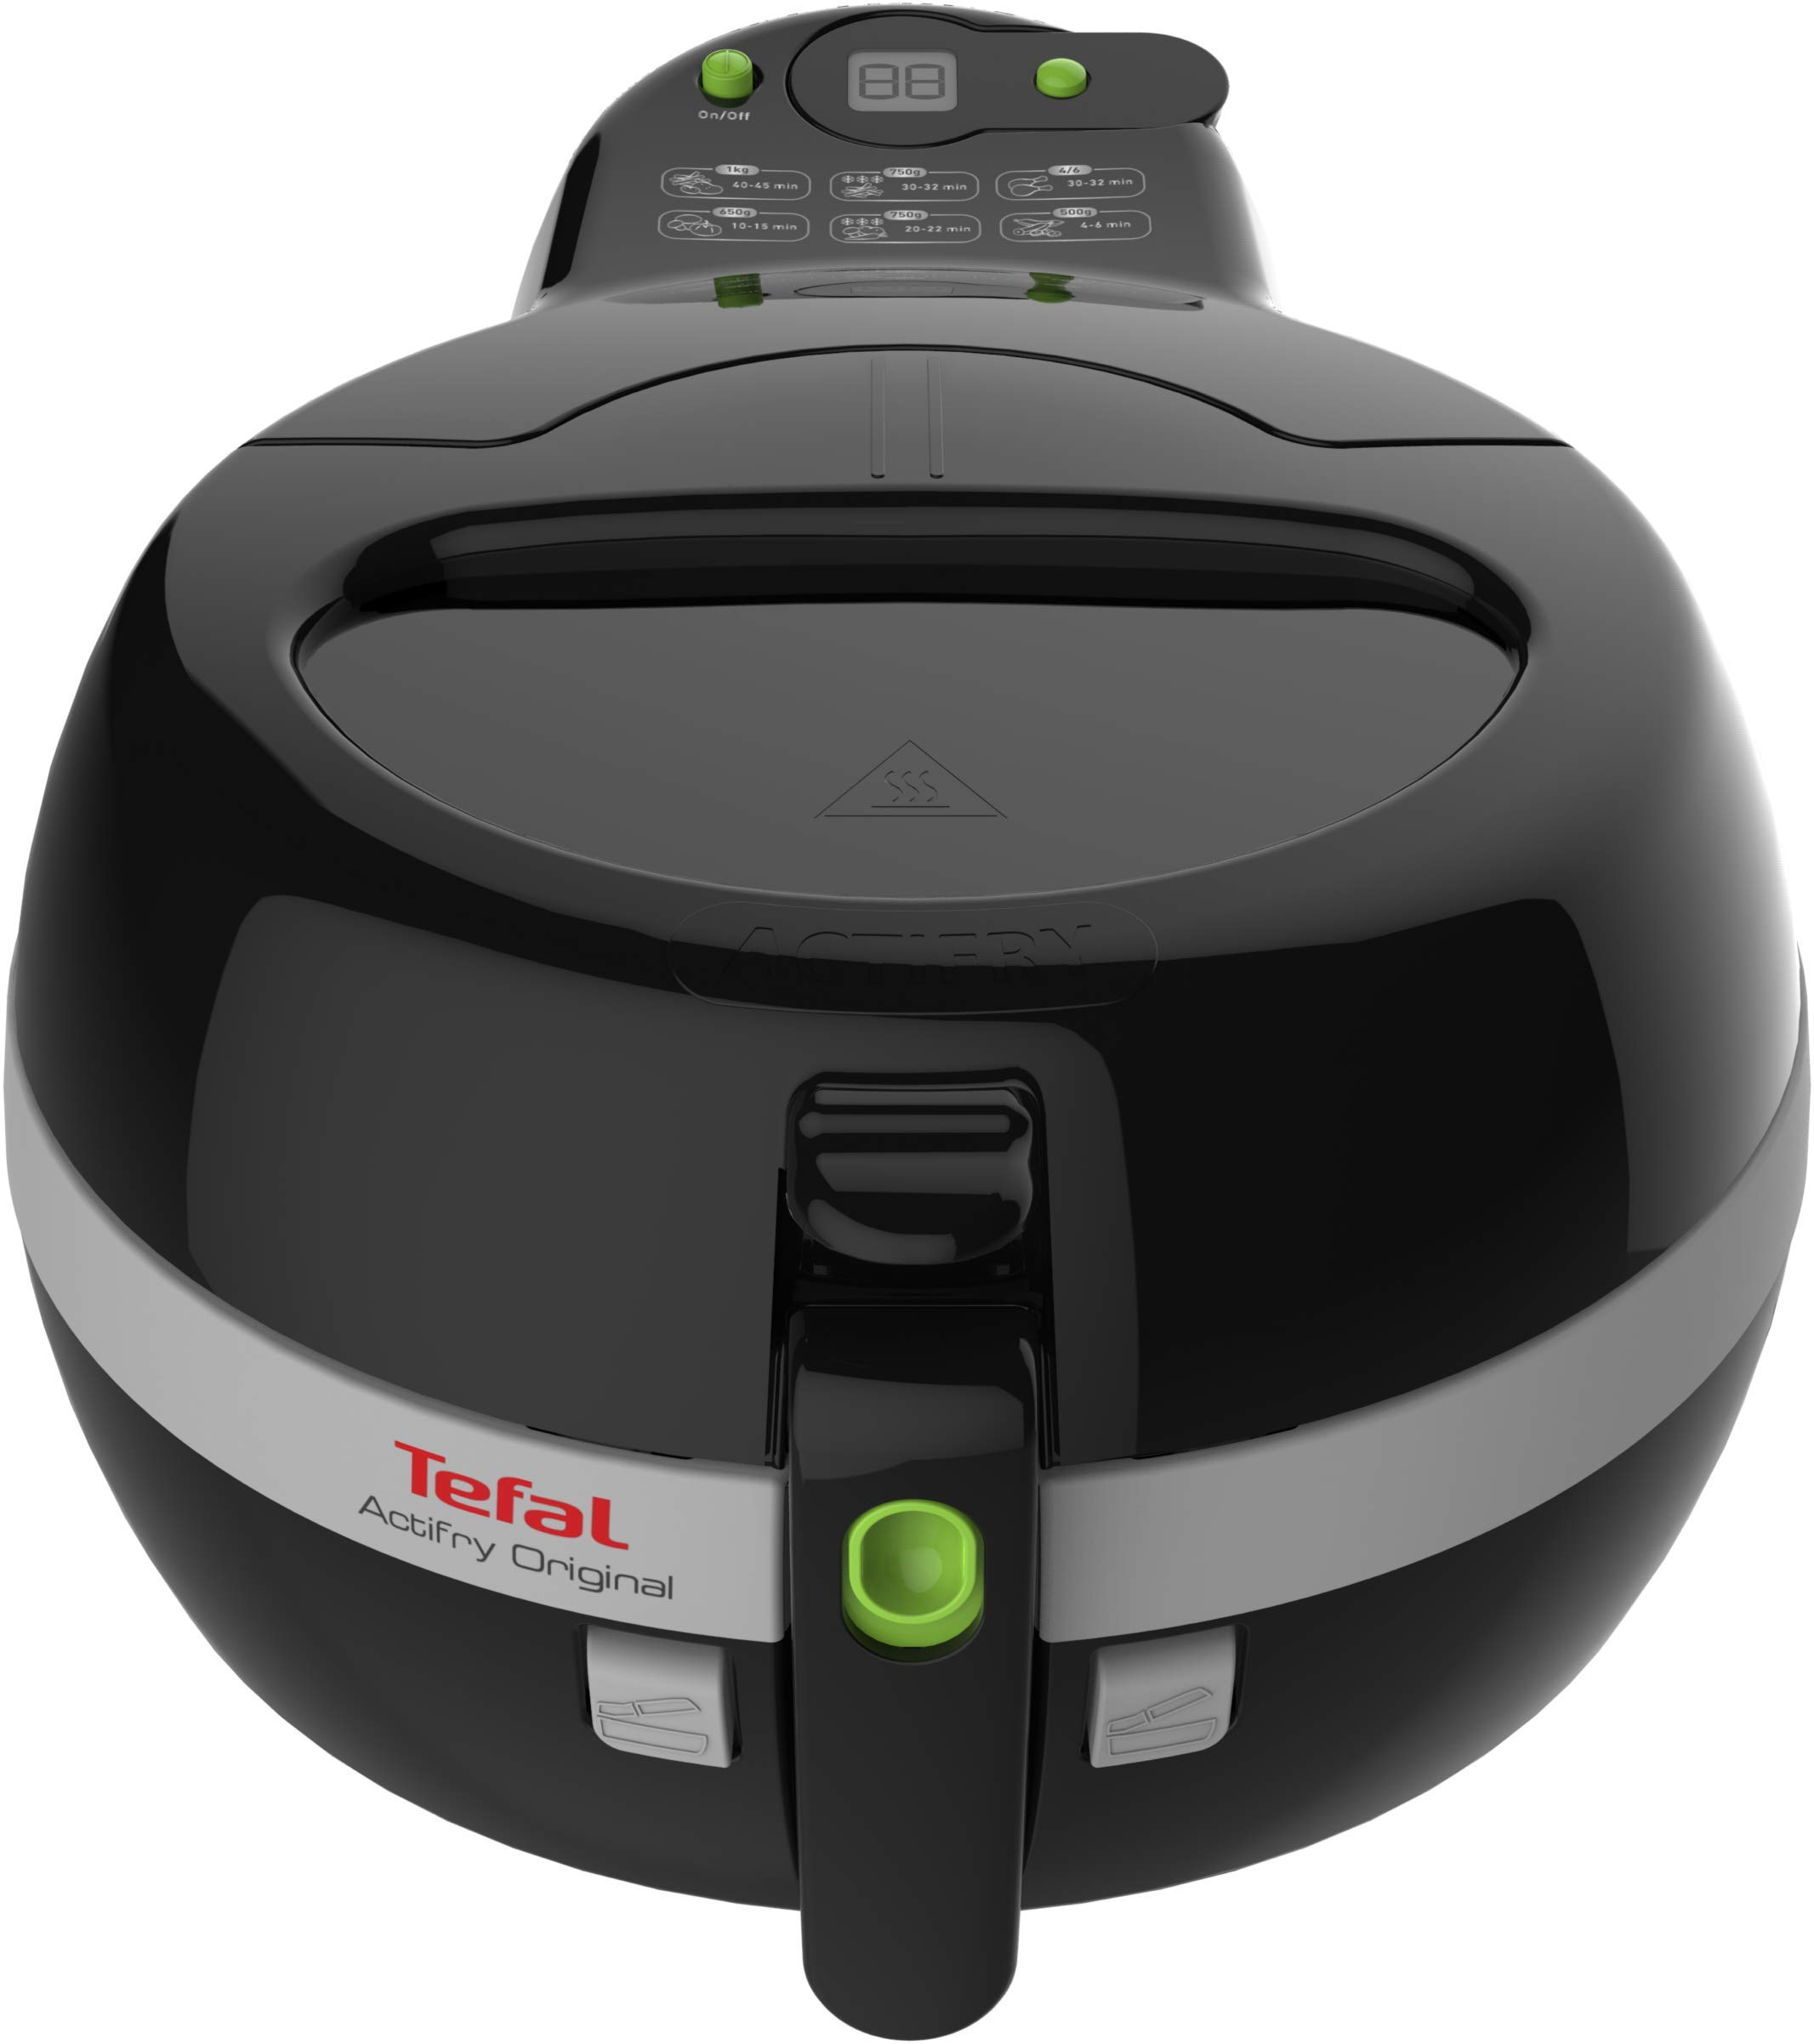 Tefal FZ 7108 Actifry Heißluftfritteuse mit Antihaftbeschichtung, schwarz